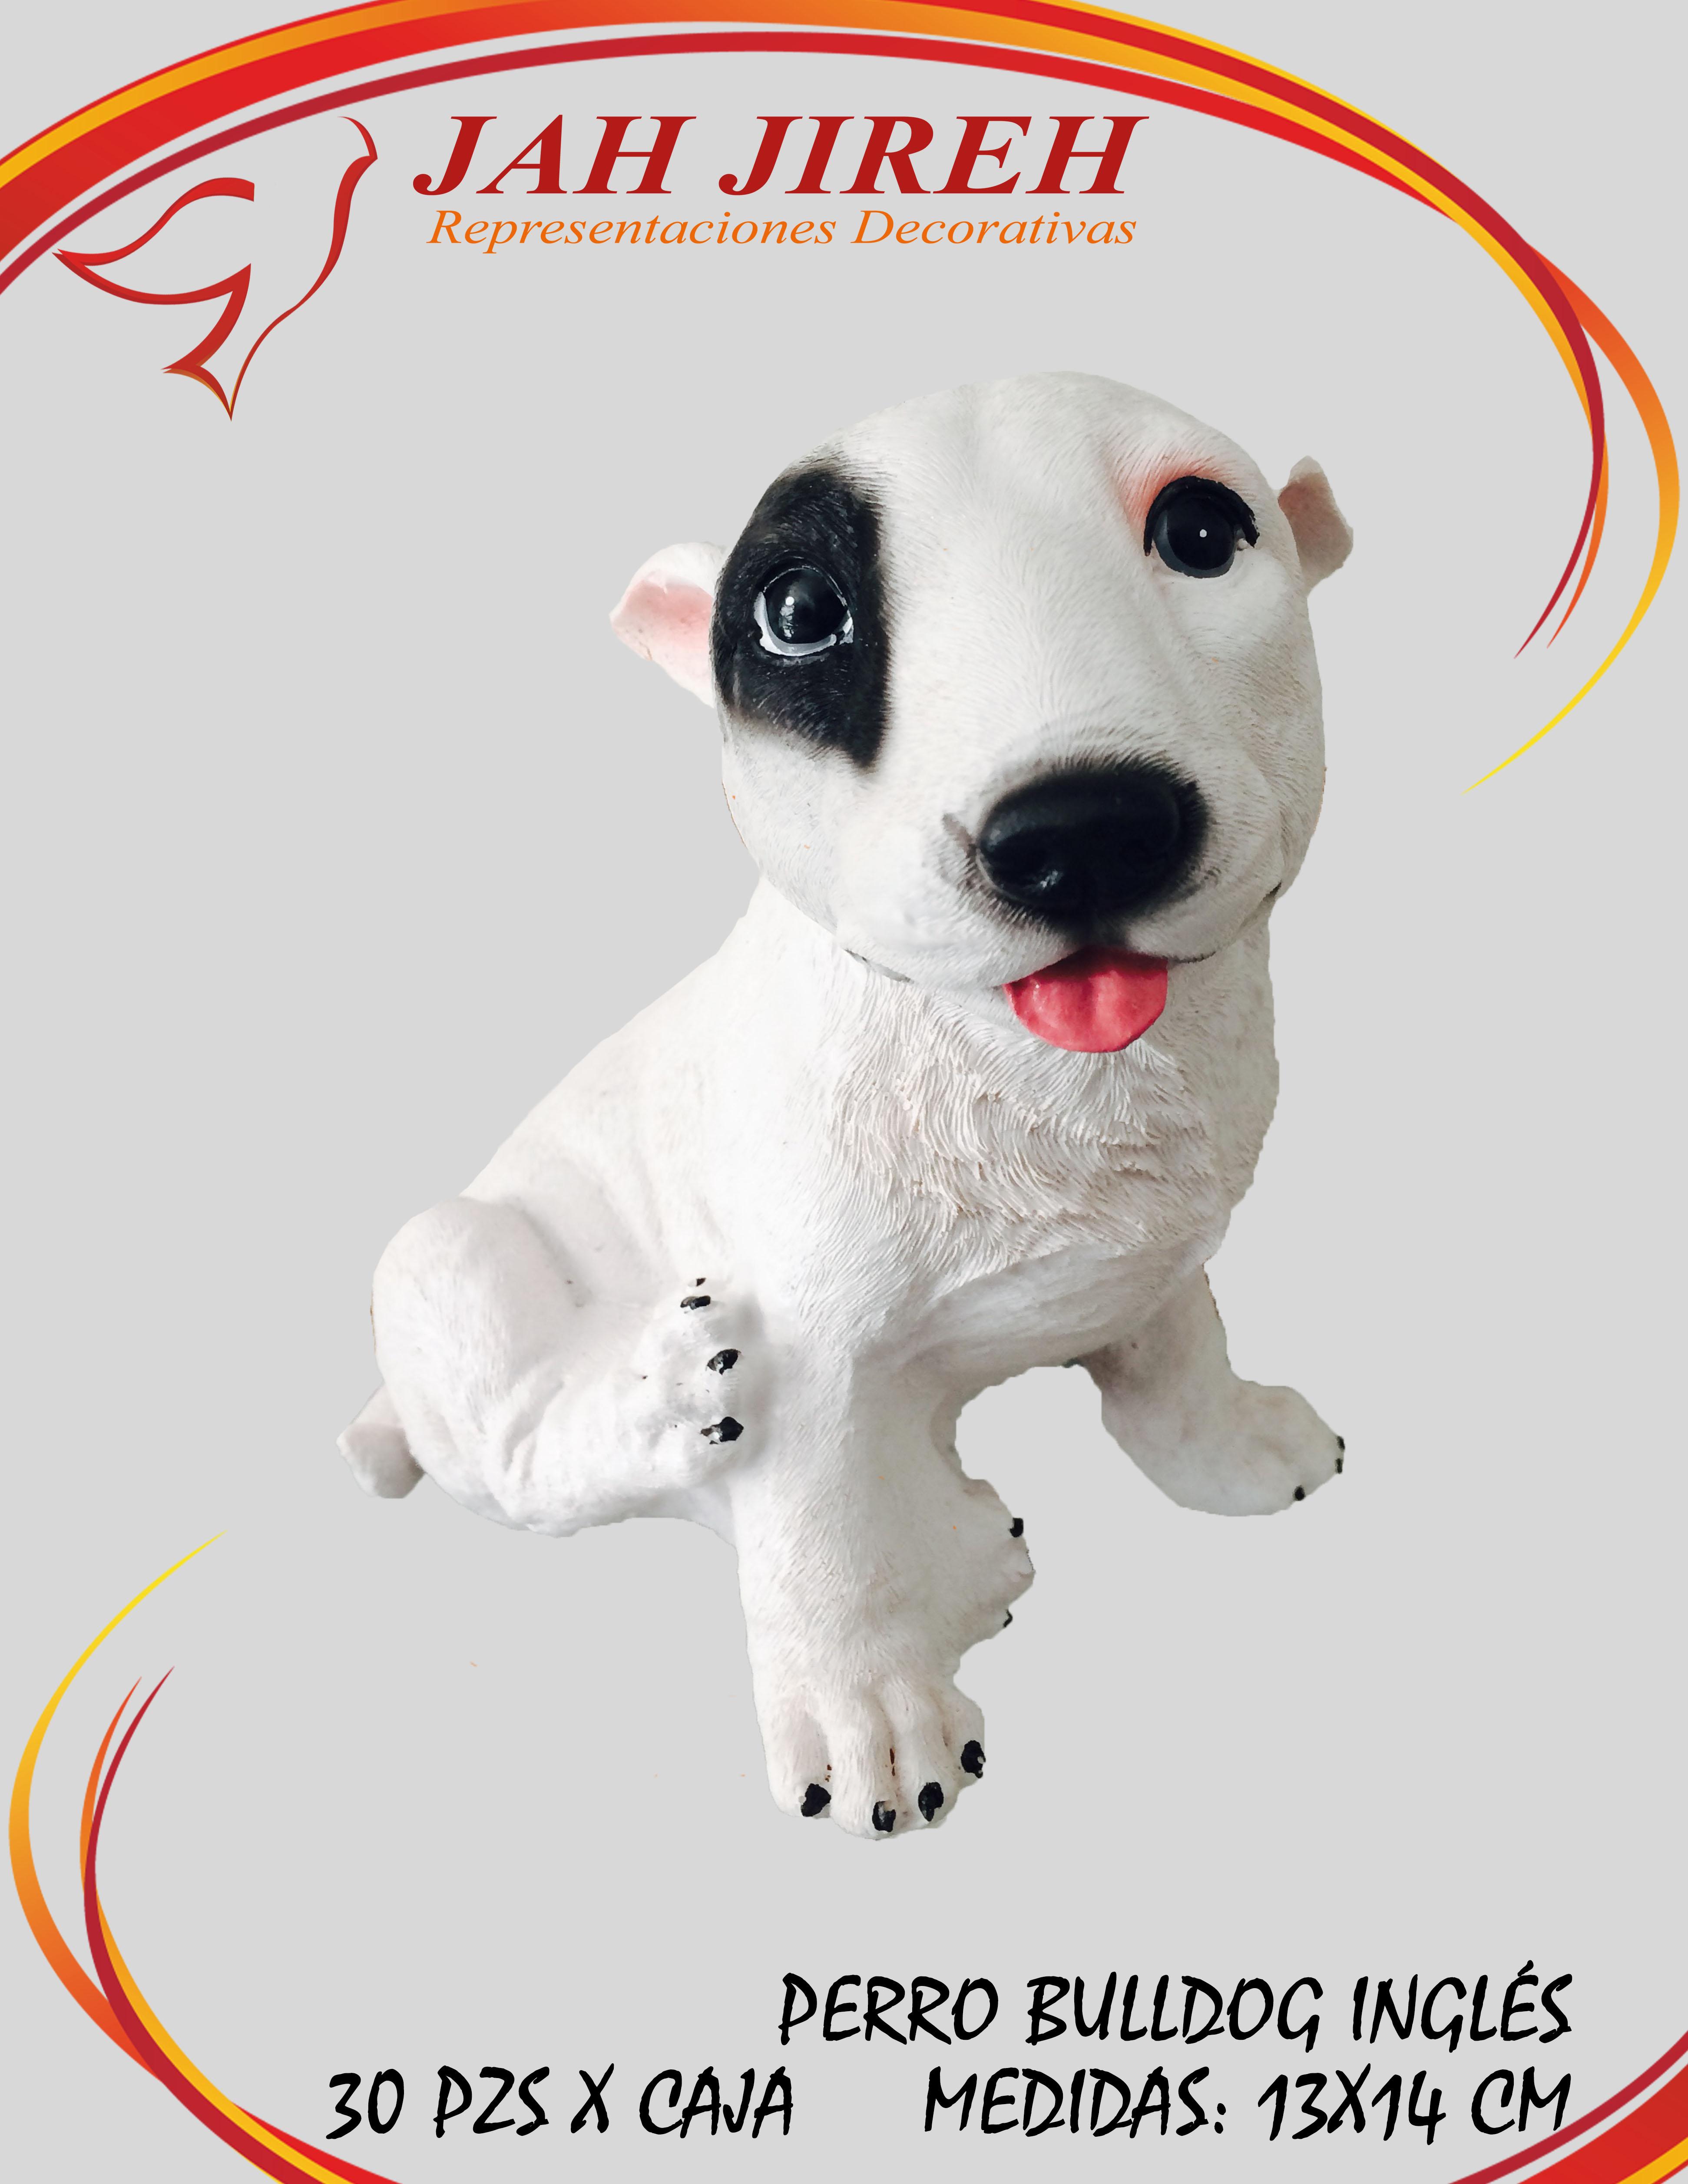 https://0201.nccdn.net/1_2/000/000/194/f8c/perro-bulldog-ingl--s.jpg